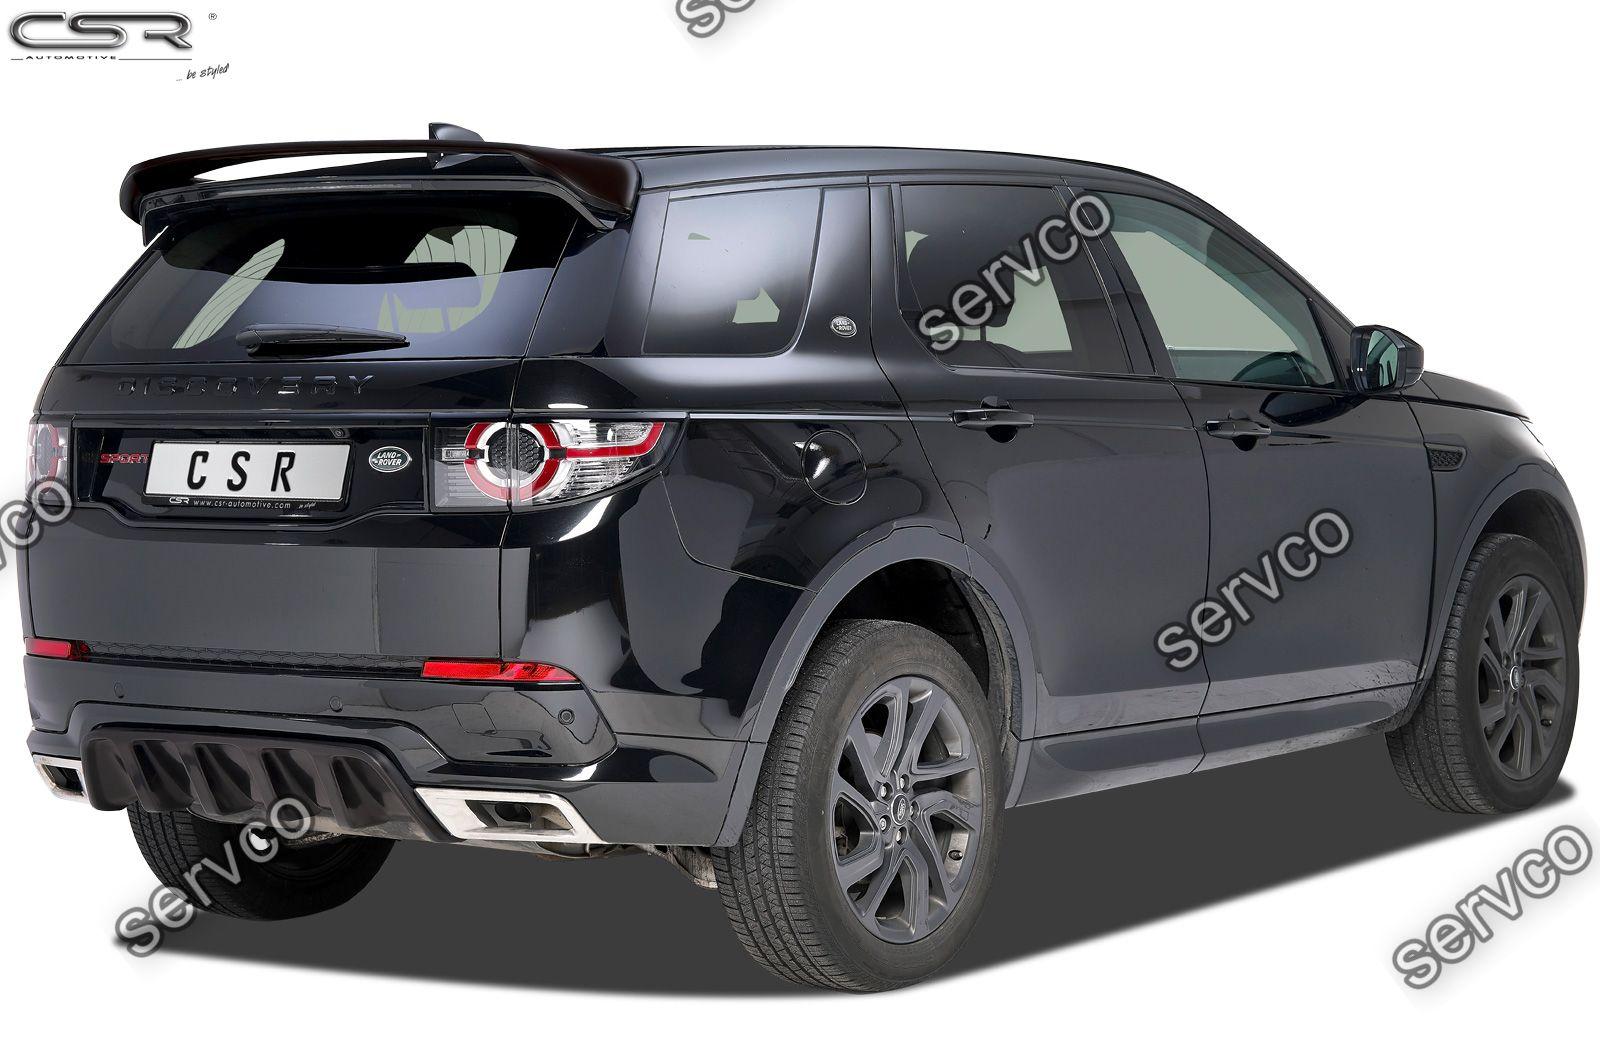 Prelungire difuzor tuning sport bara spate Land Rover Discovery Sport CSR HA203 2015- v1